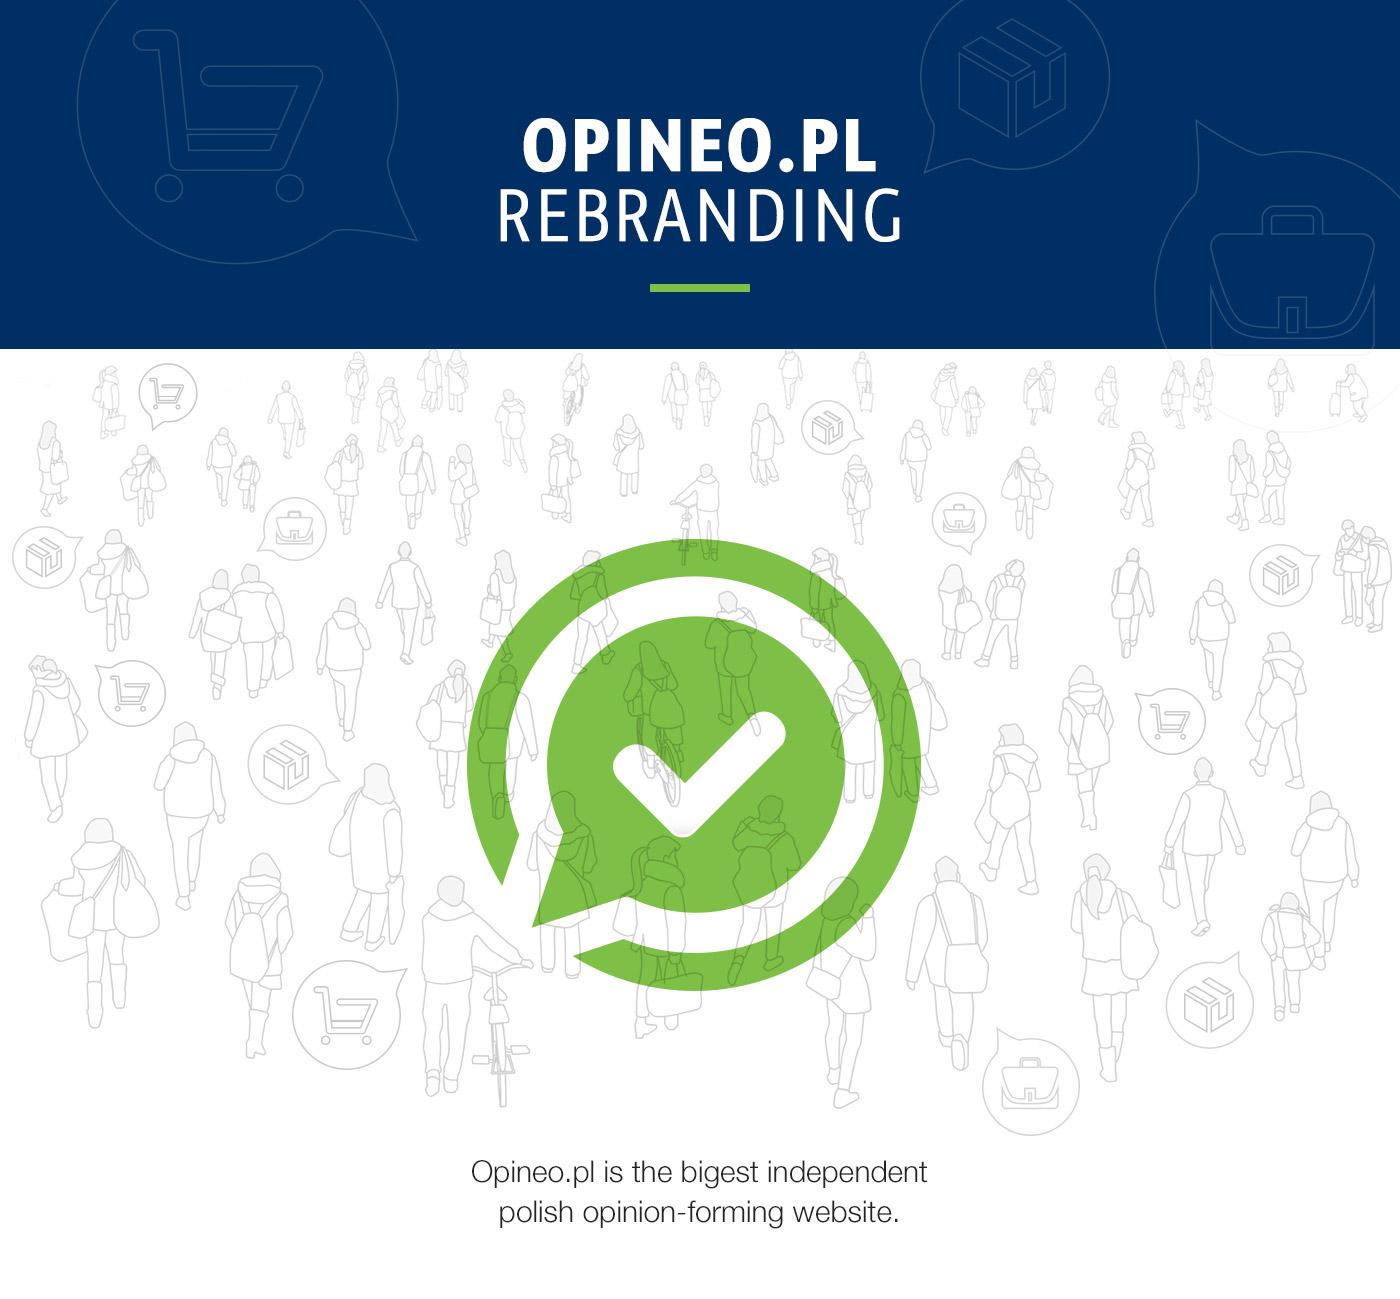 logo brand brand identity identity opineo opineo.pl Logo Design Corporate Identity